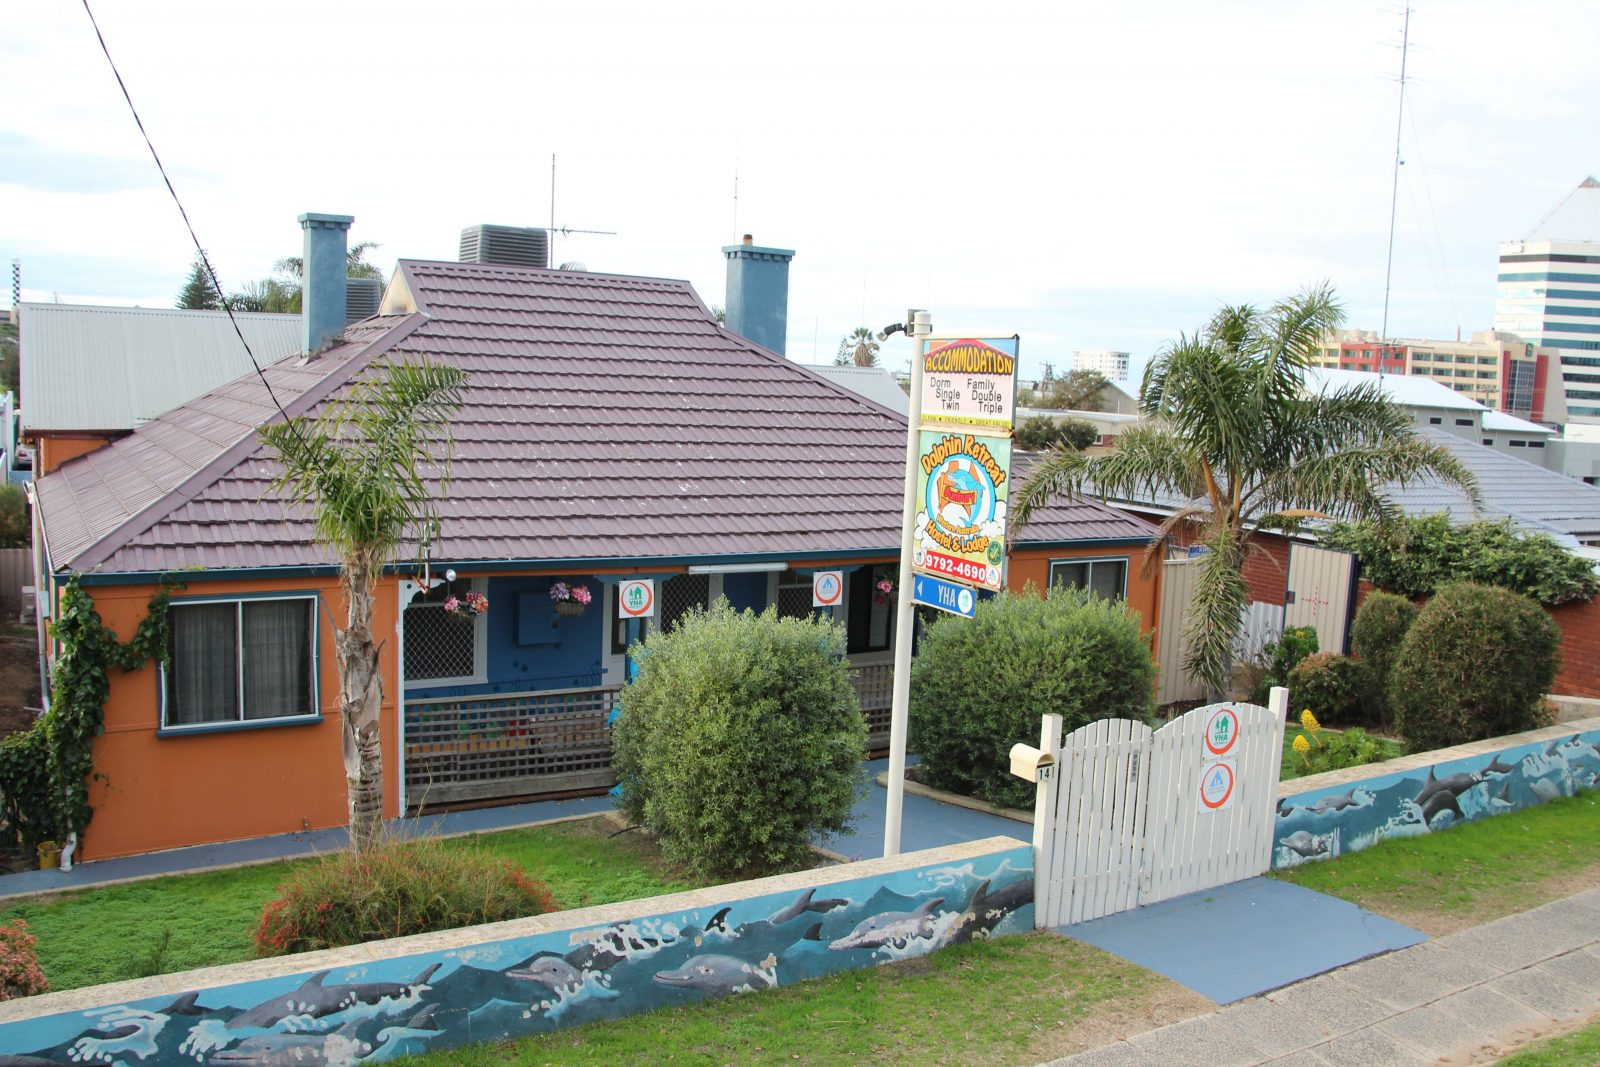 Dolphin Retreat Bunbury Hostel and Lodge, Bunbury, Western Australia